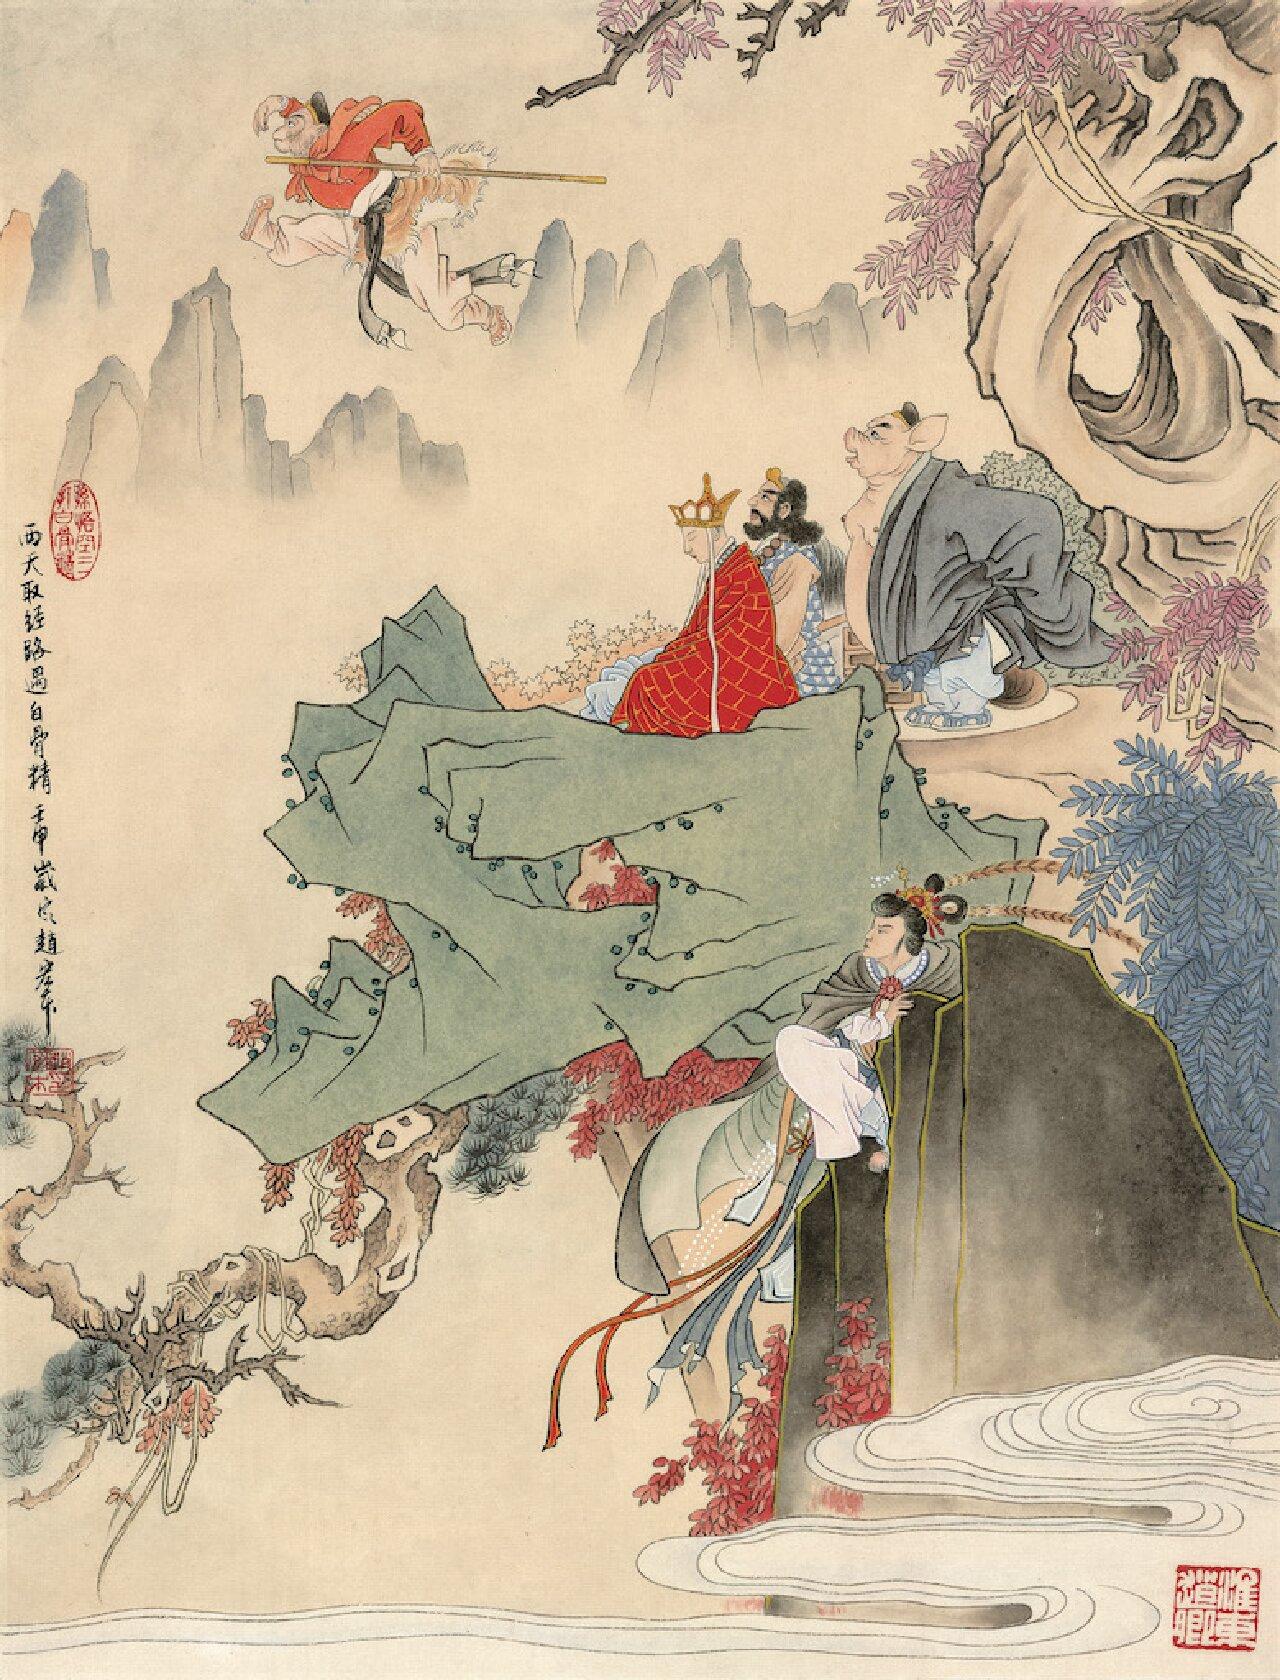 viaje al oeste dragon ball influencia